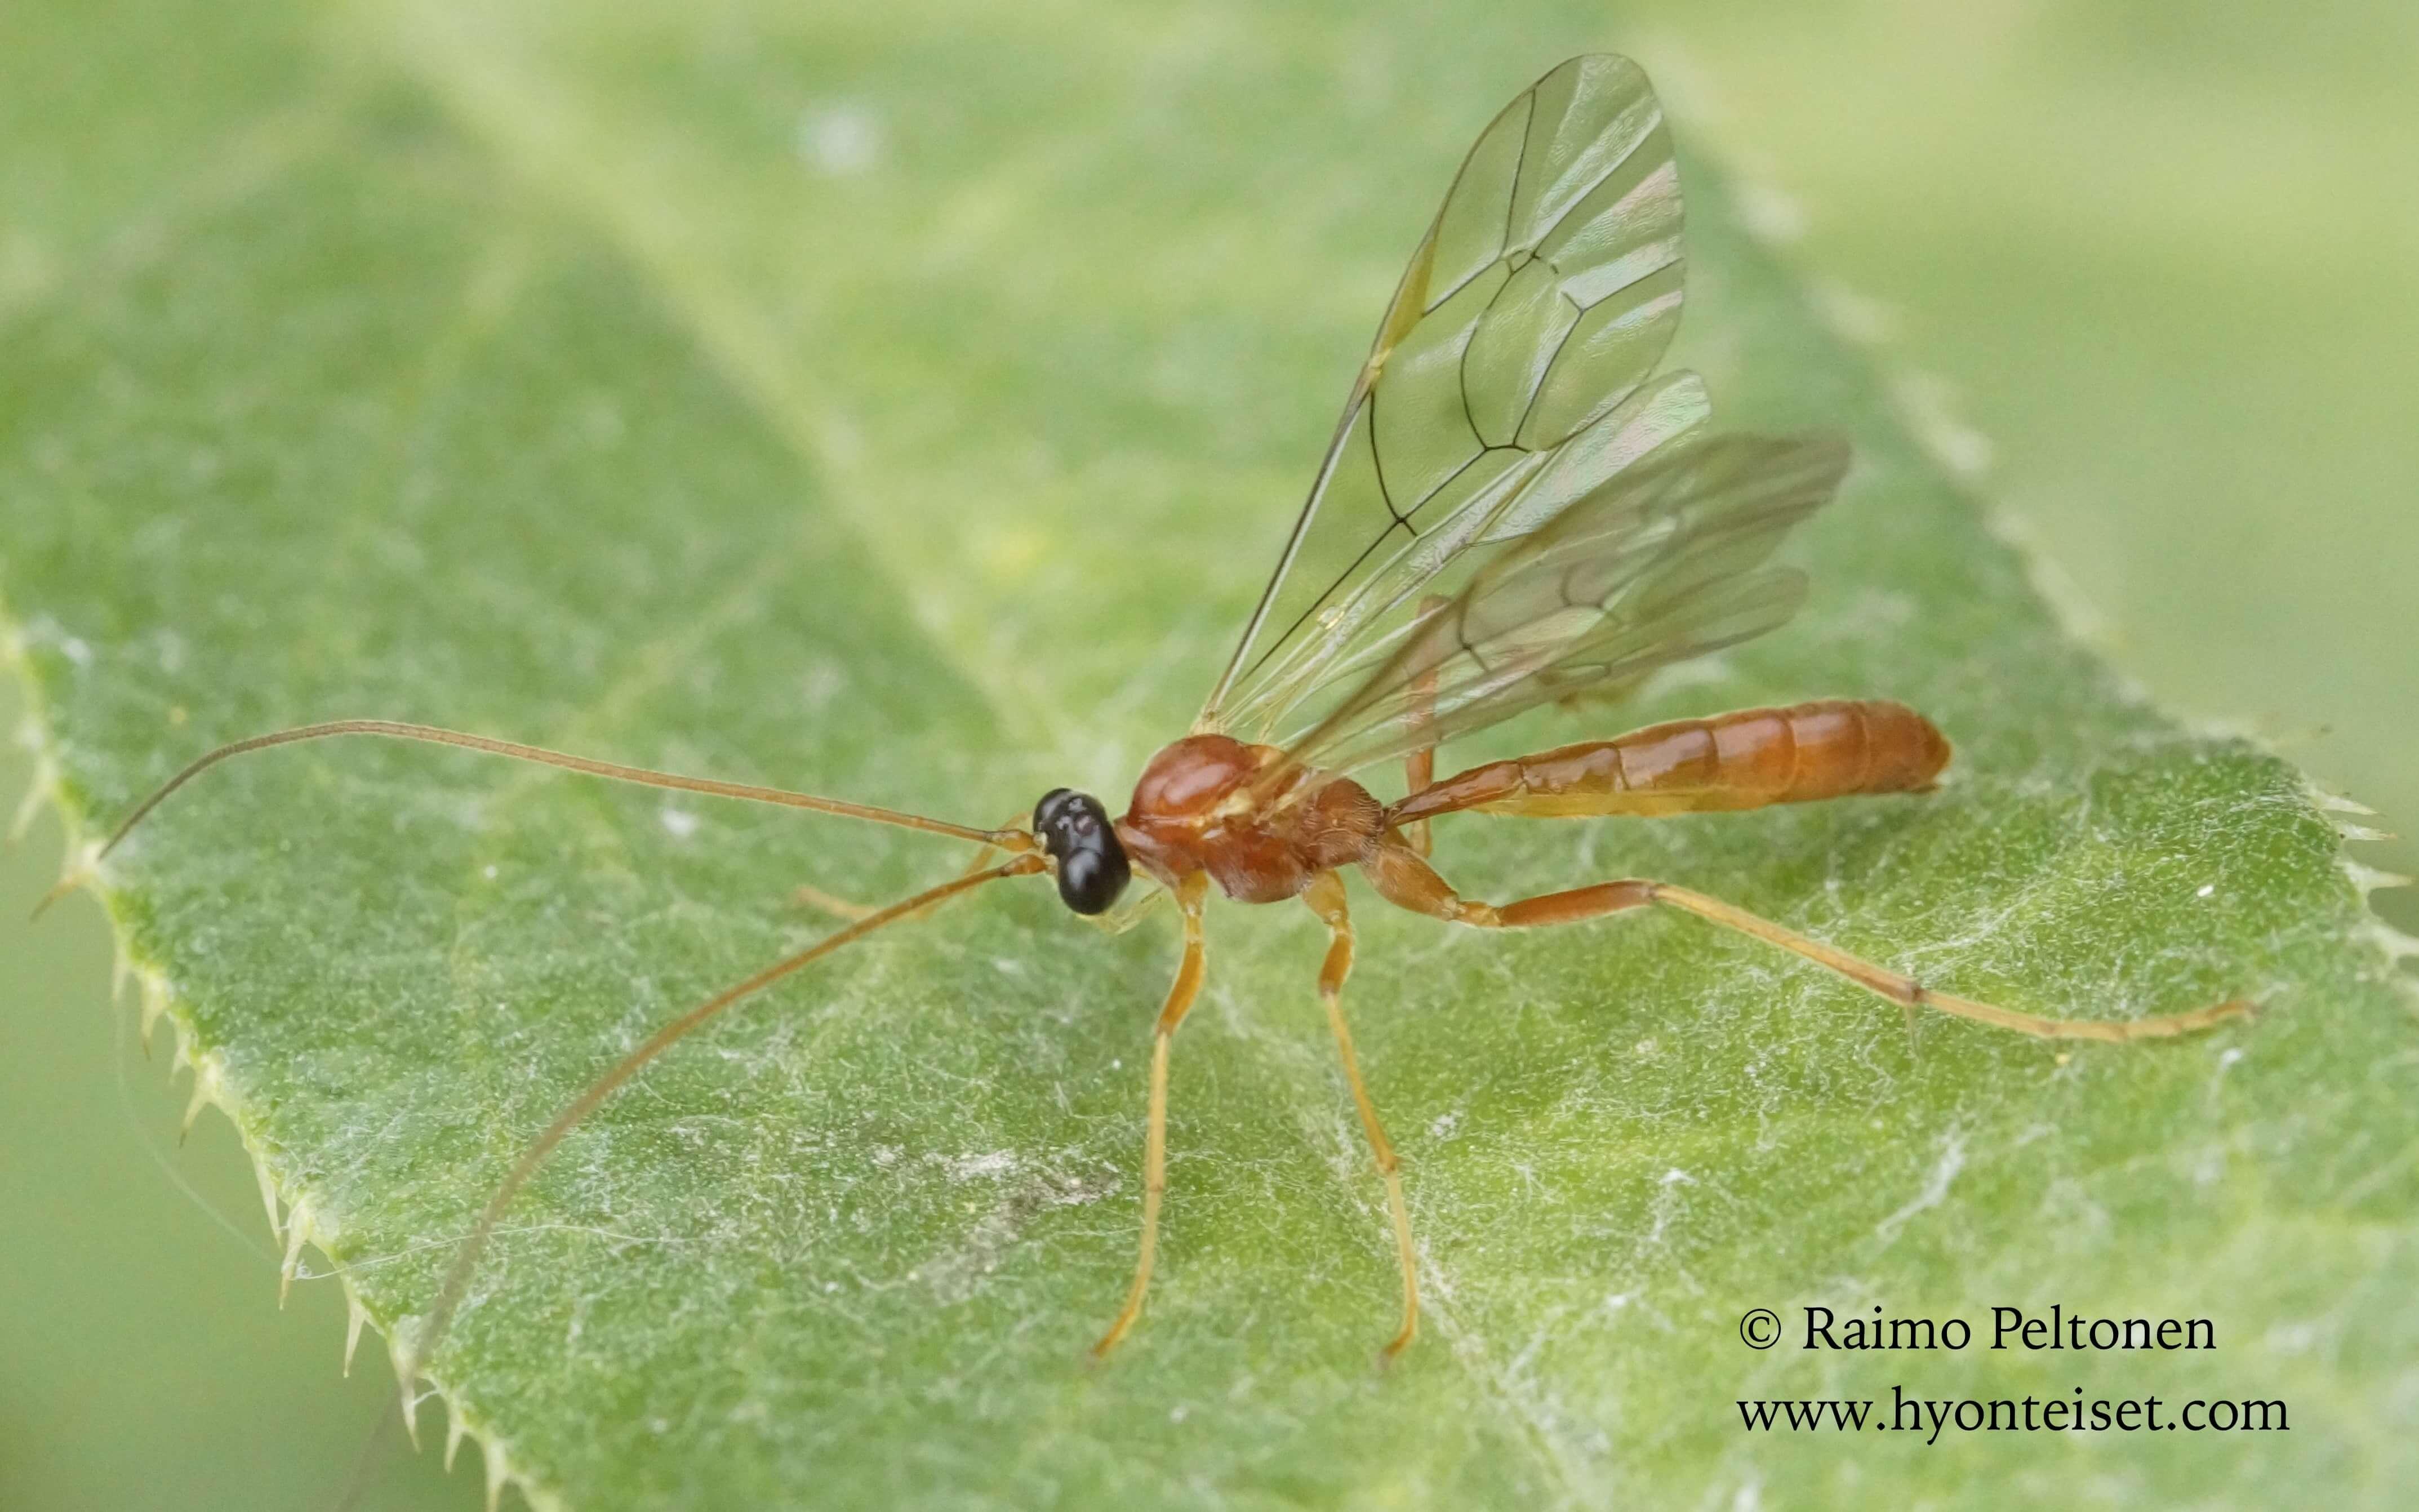 Tryphoninae, cf. Netellia sp. (det. Camille Thirion)